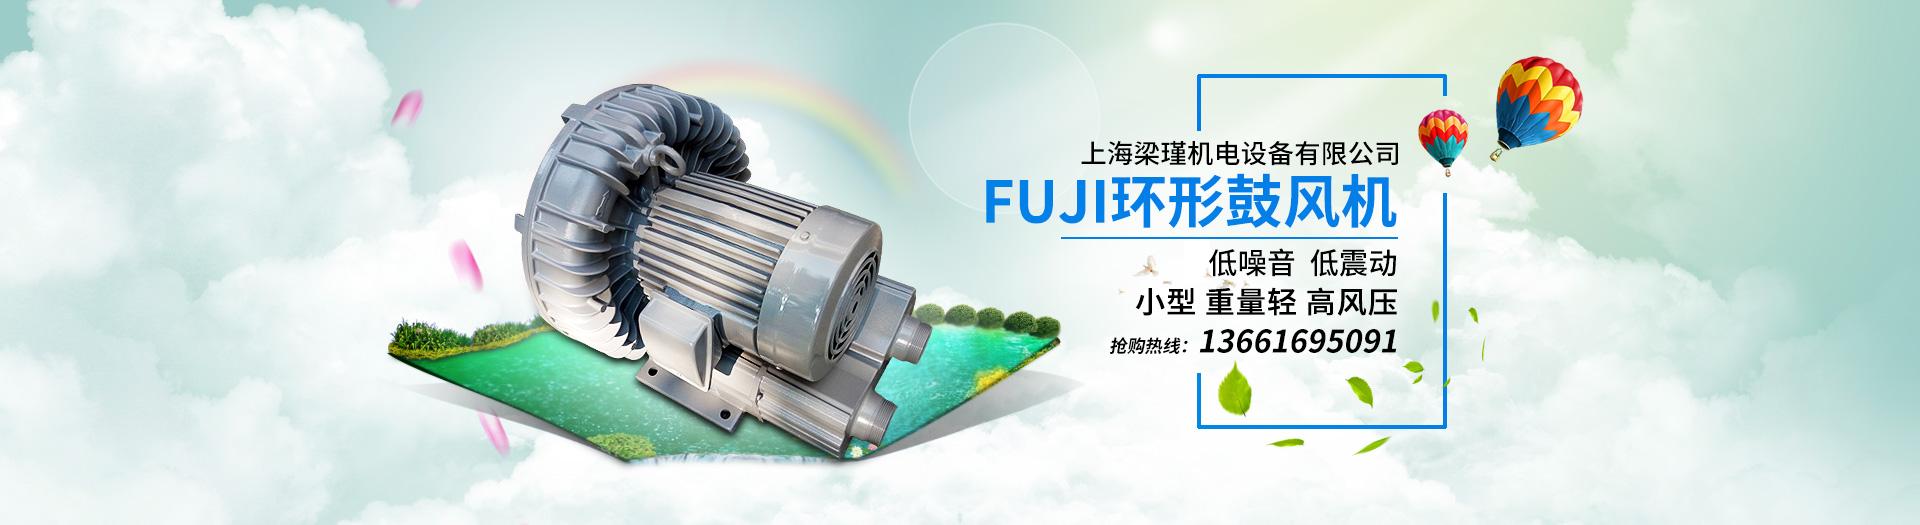 FUJI富士环形鼓风机